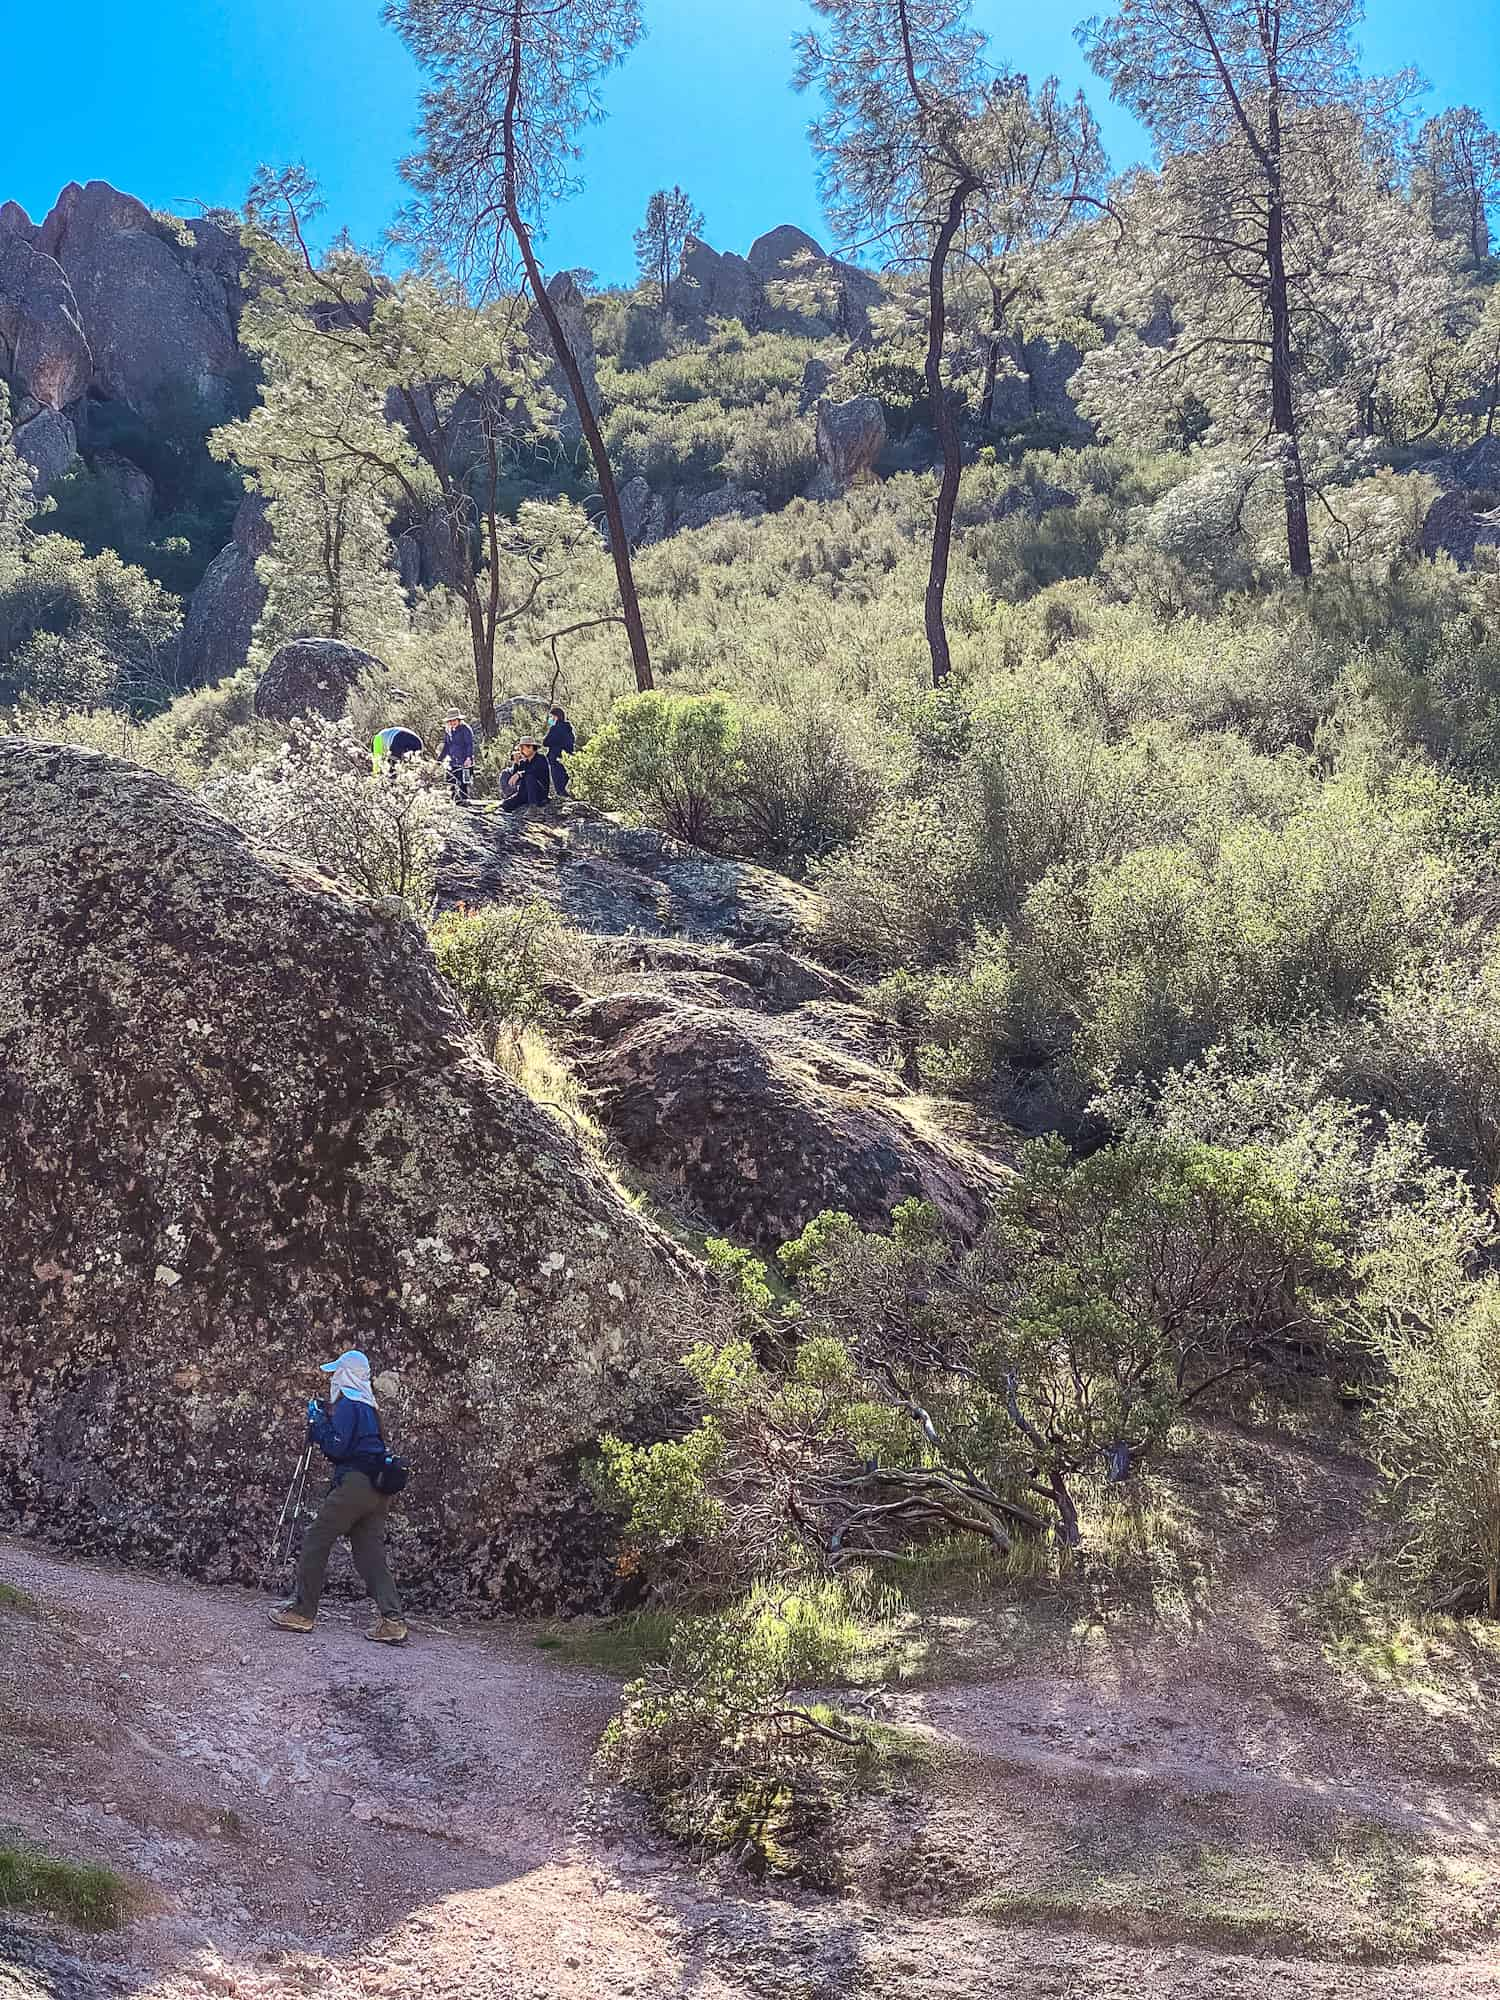 Pinnacles National Parks Hikes - Group Hiking